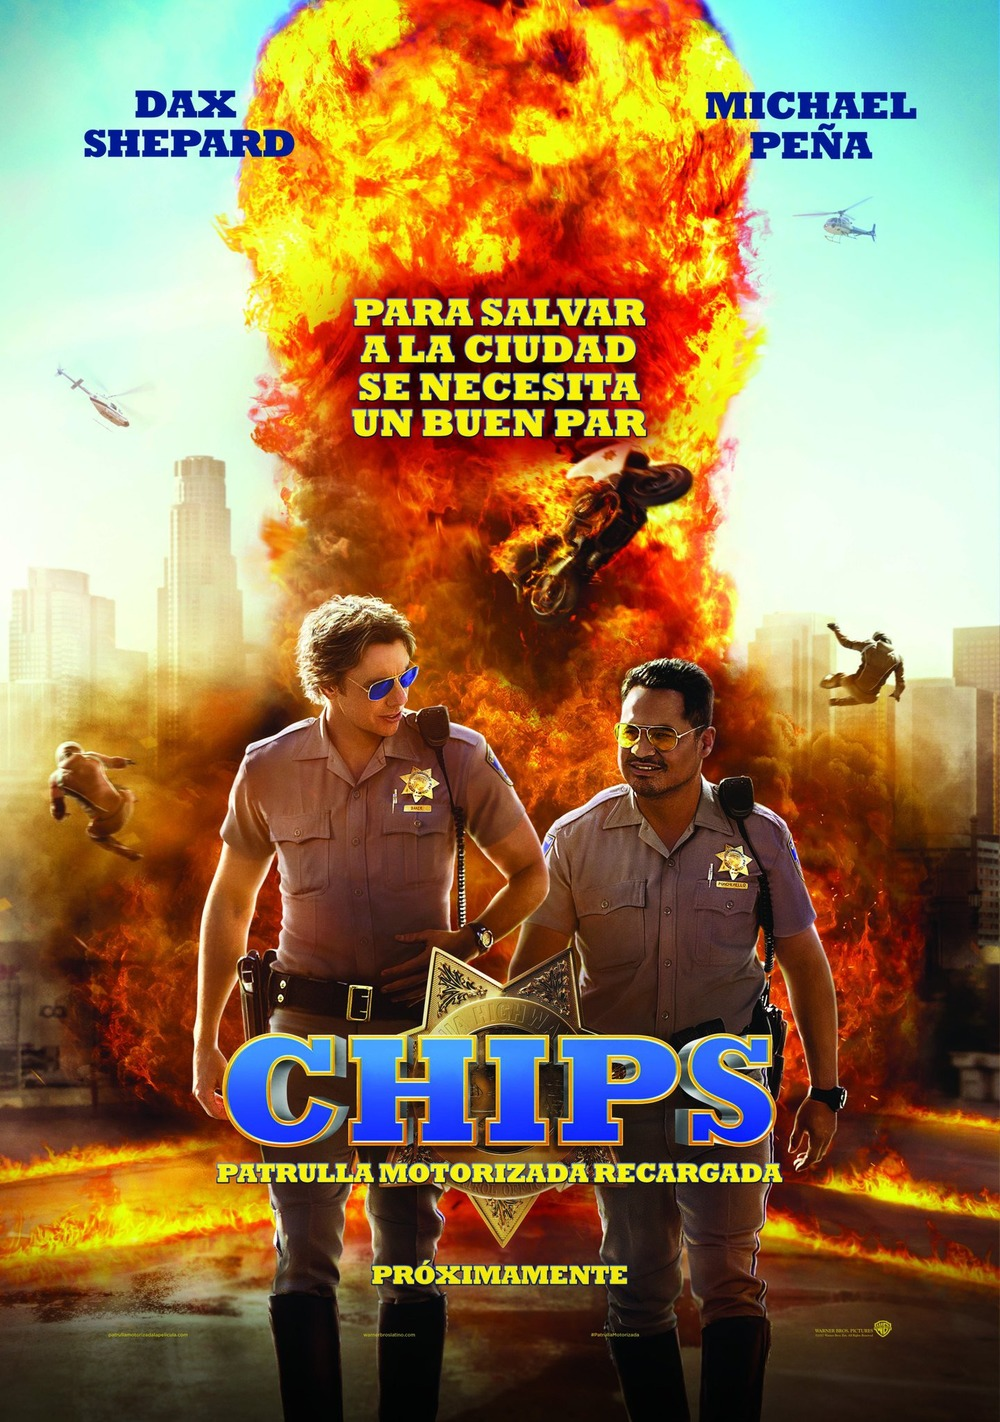 chips2017sssssssssssss.jpg